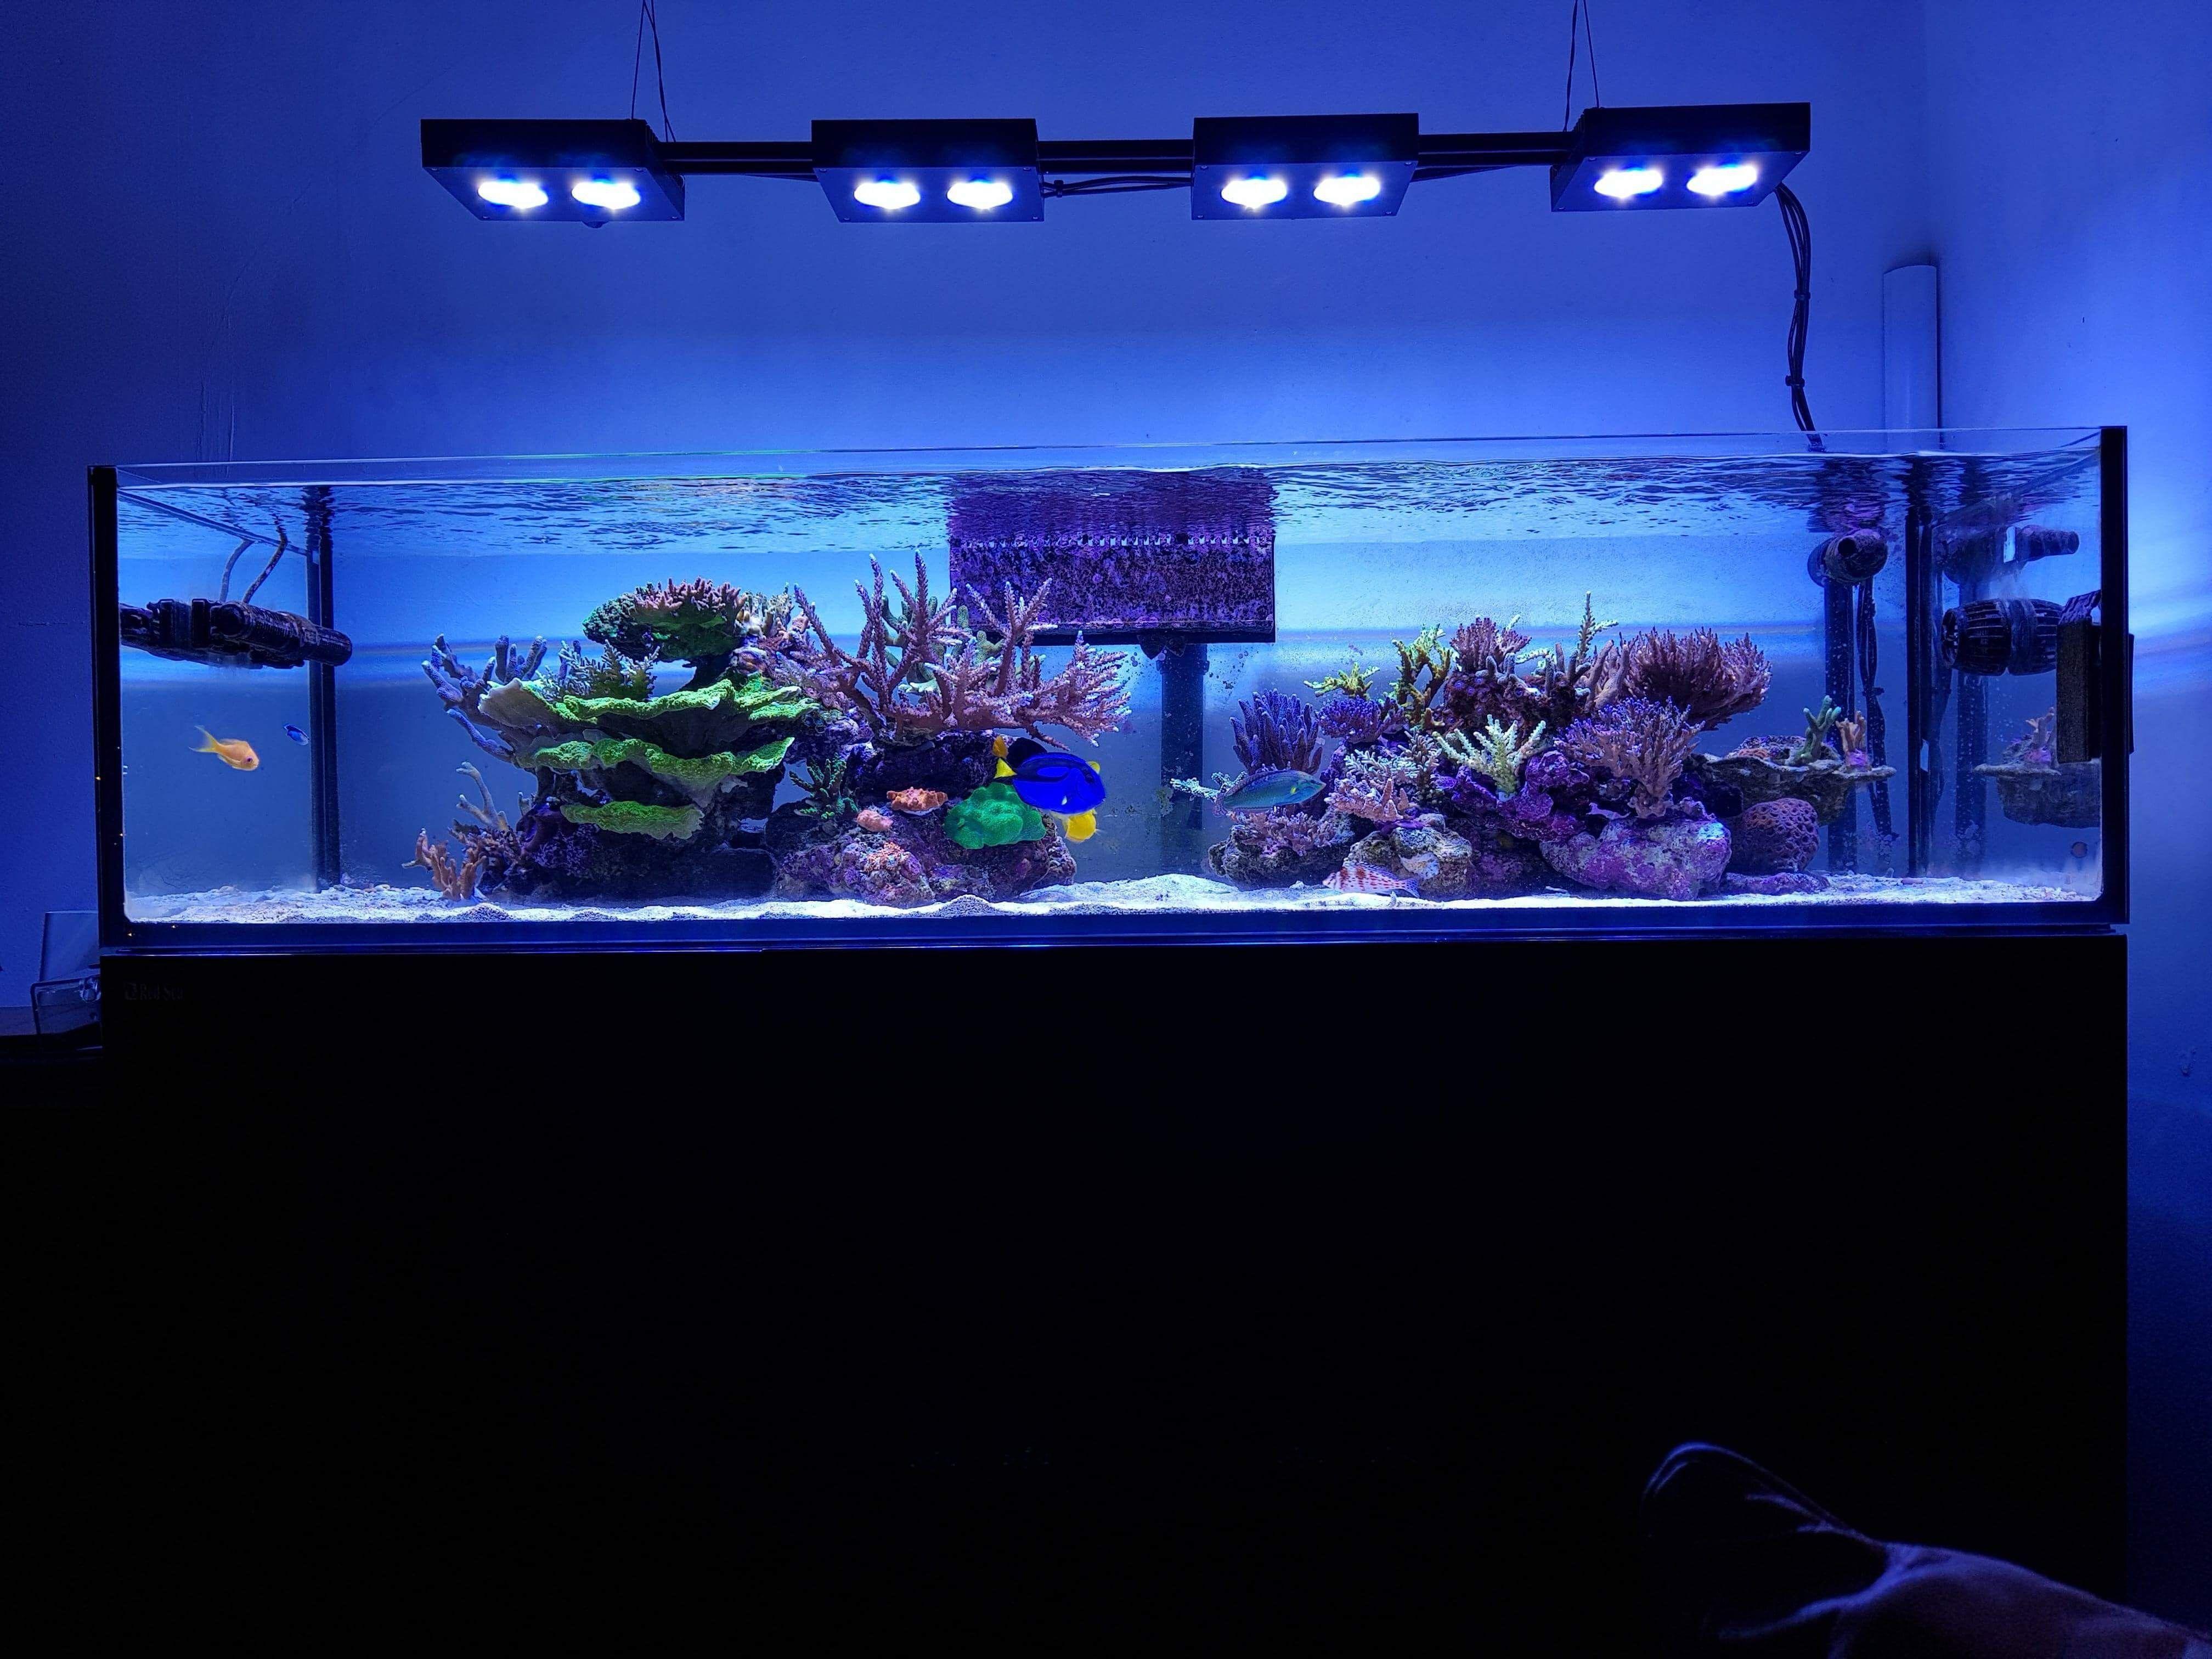 Mars Aqua 300 Watt Led Modification Marine Tank Reef Lighting Sea Tank